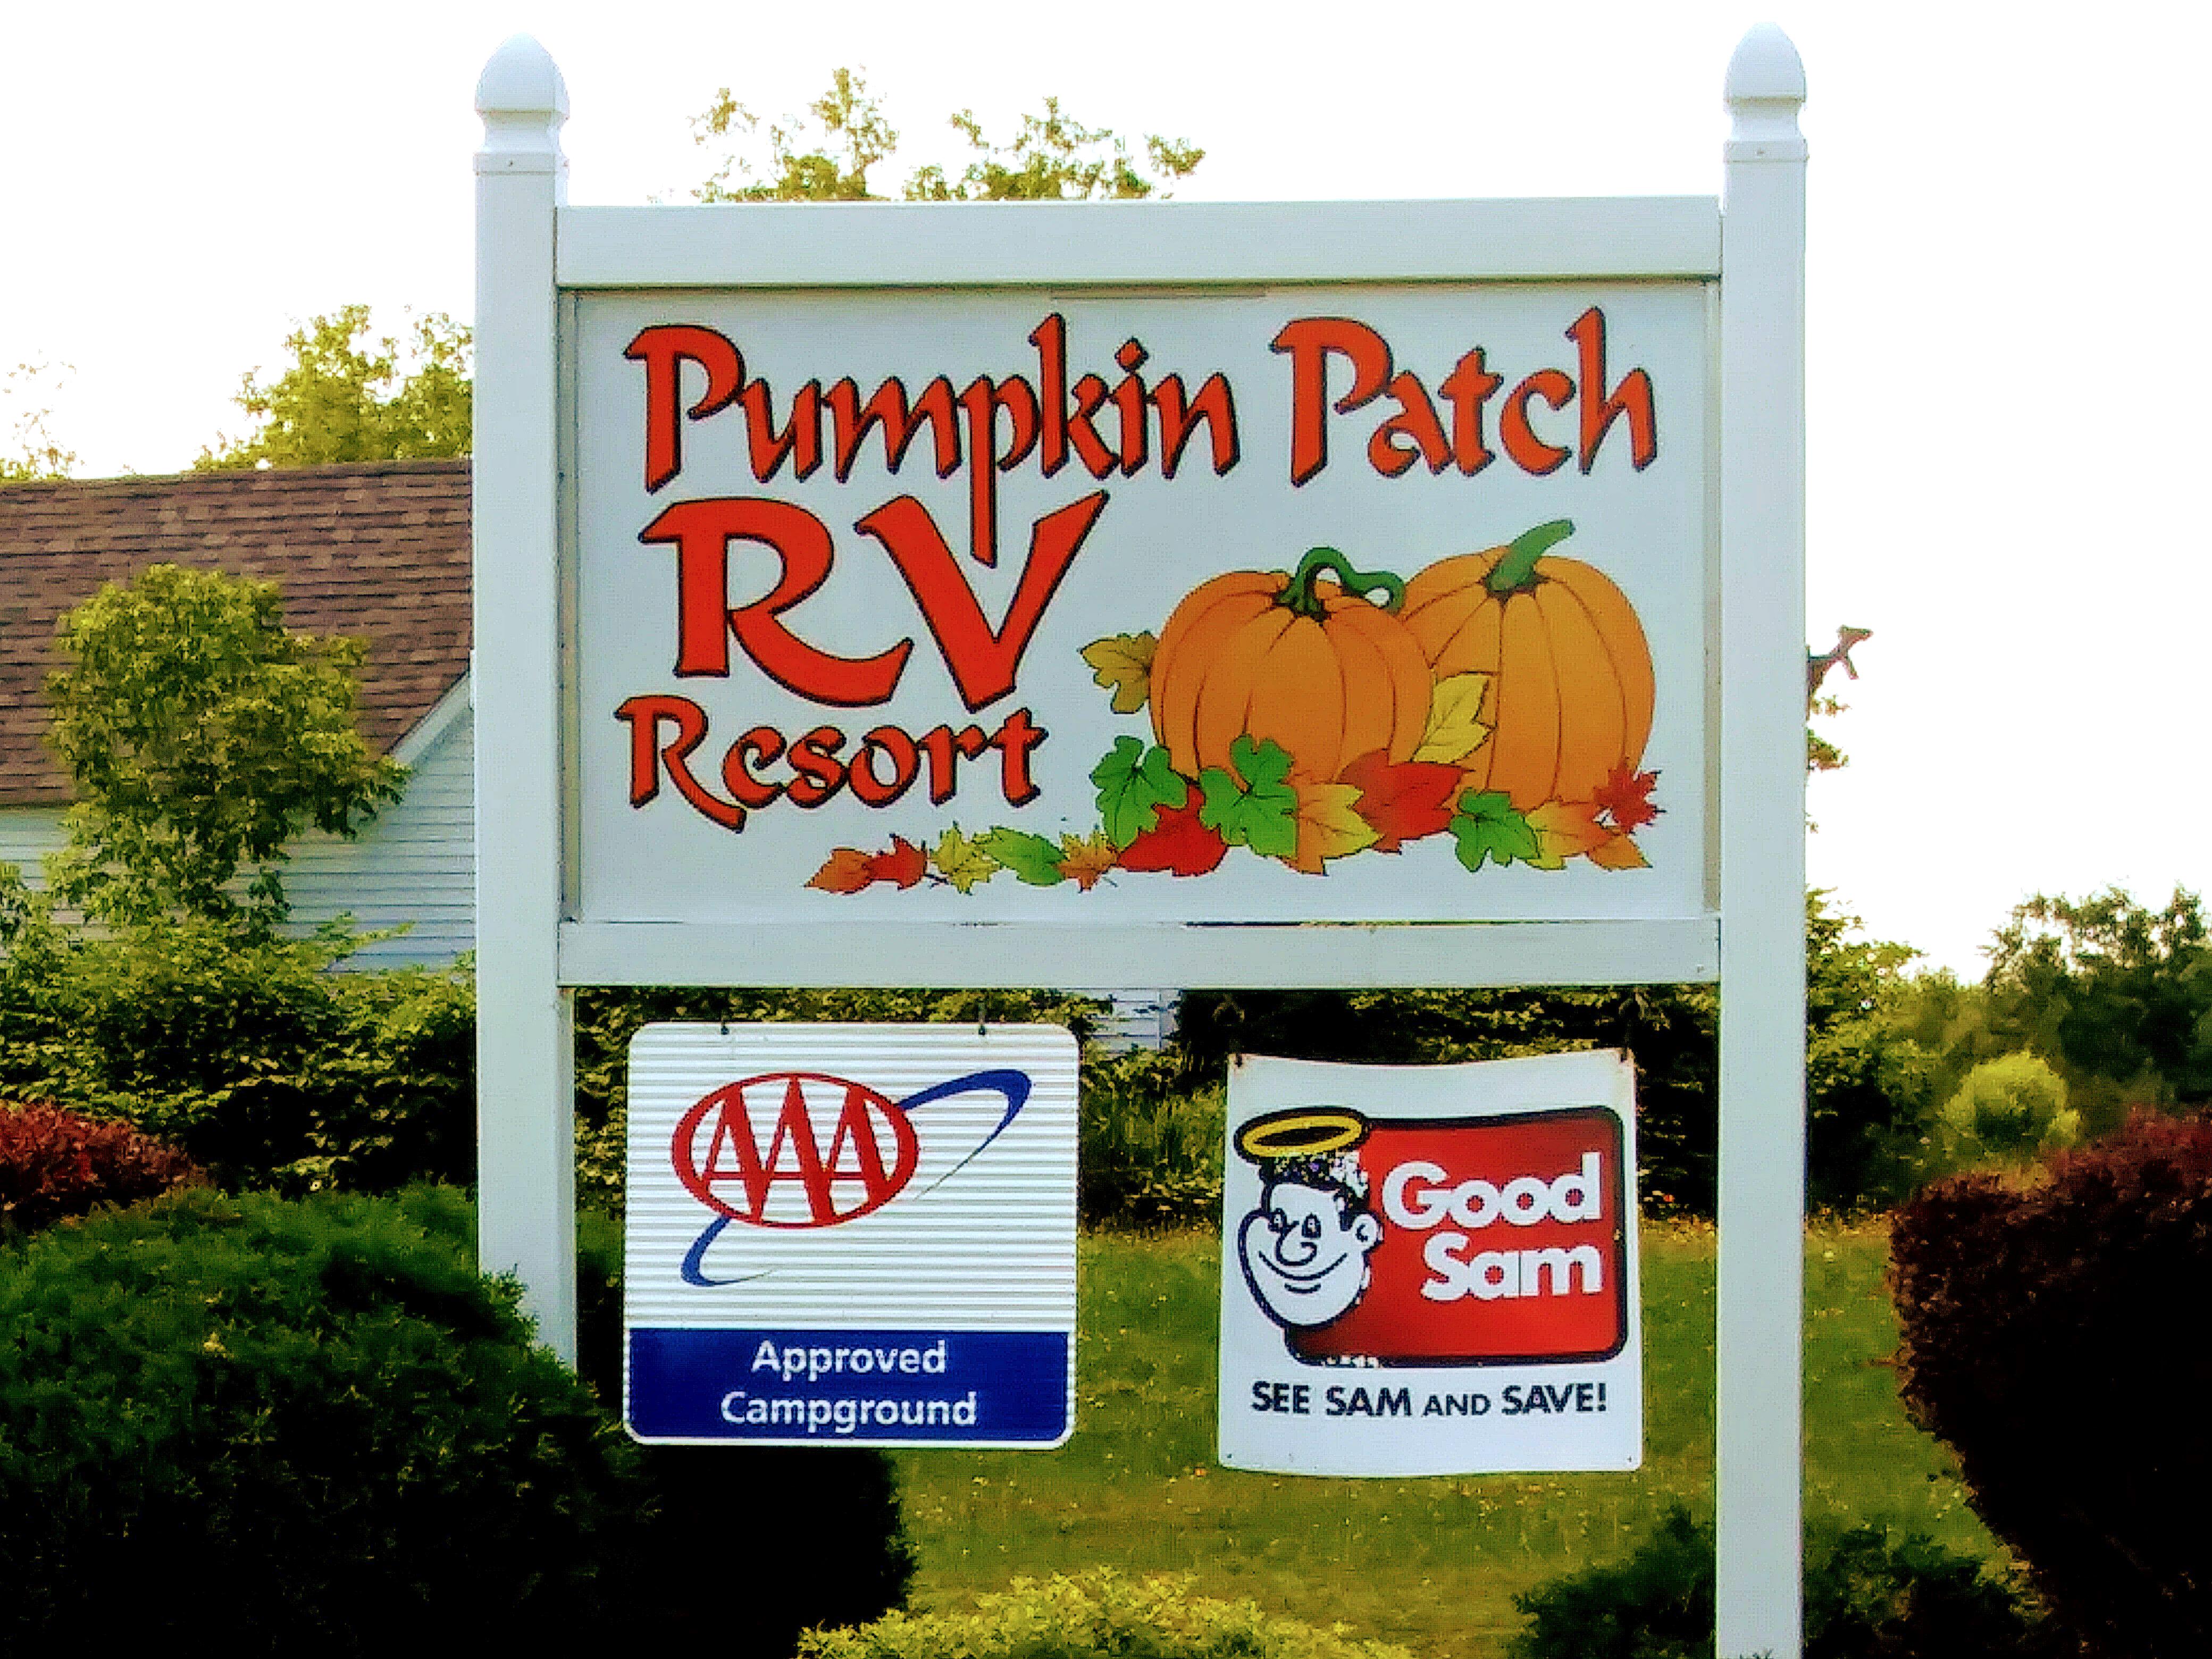 Pumpkin Patch RV Resort